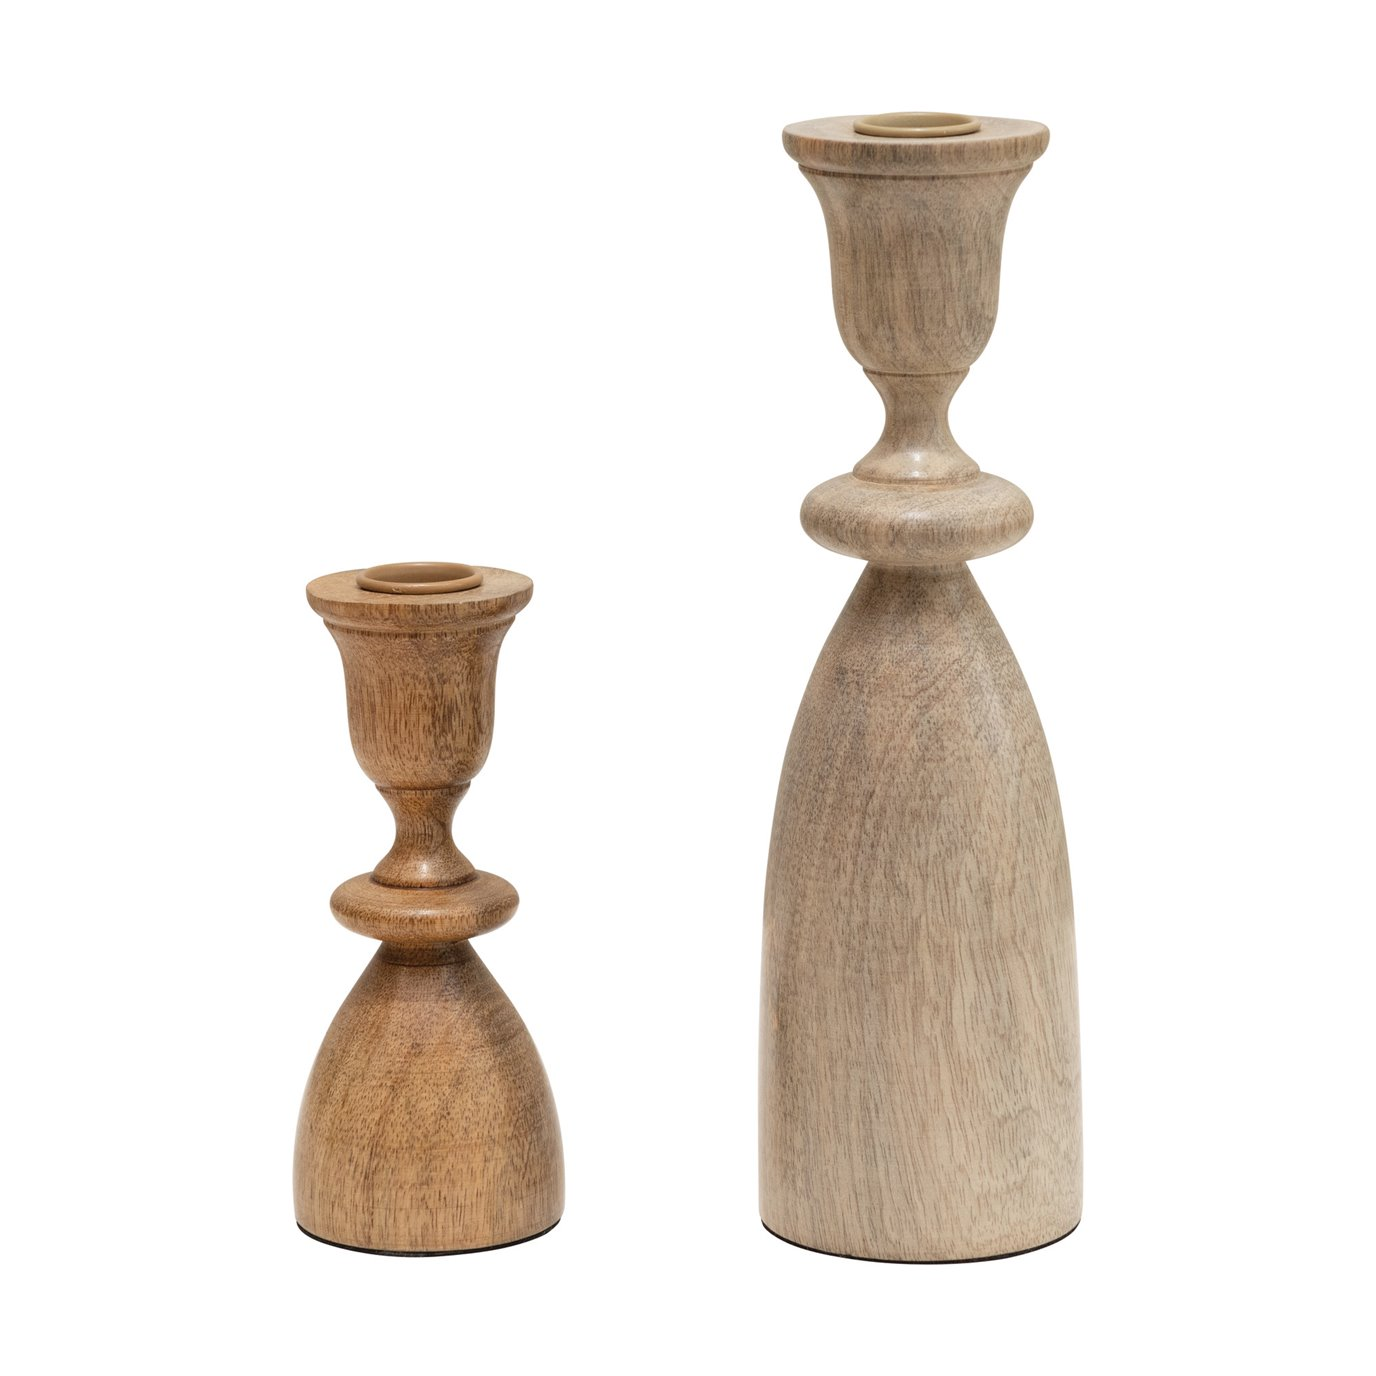 Natural Wood Taper Holders, Set of 2